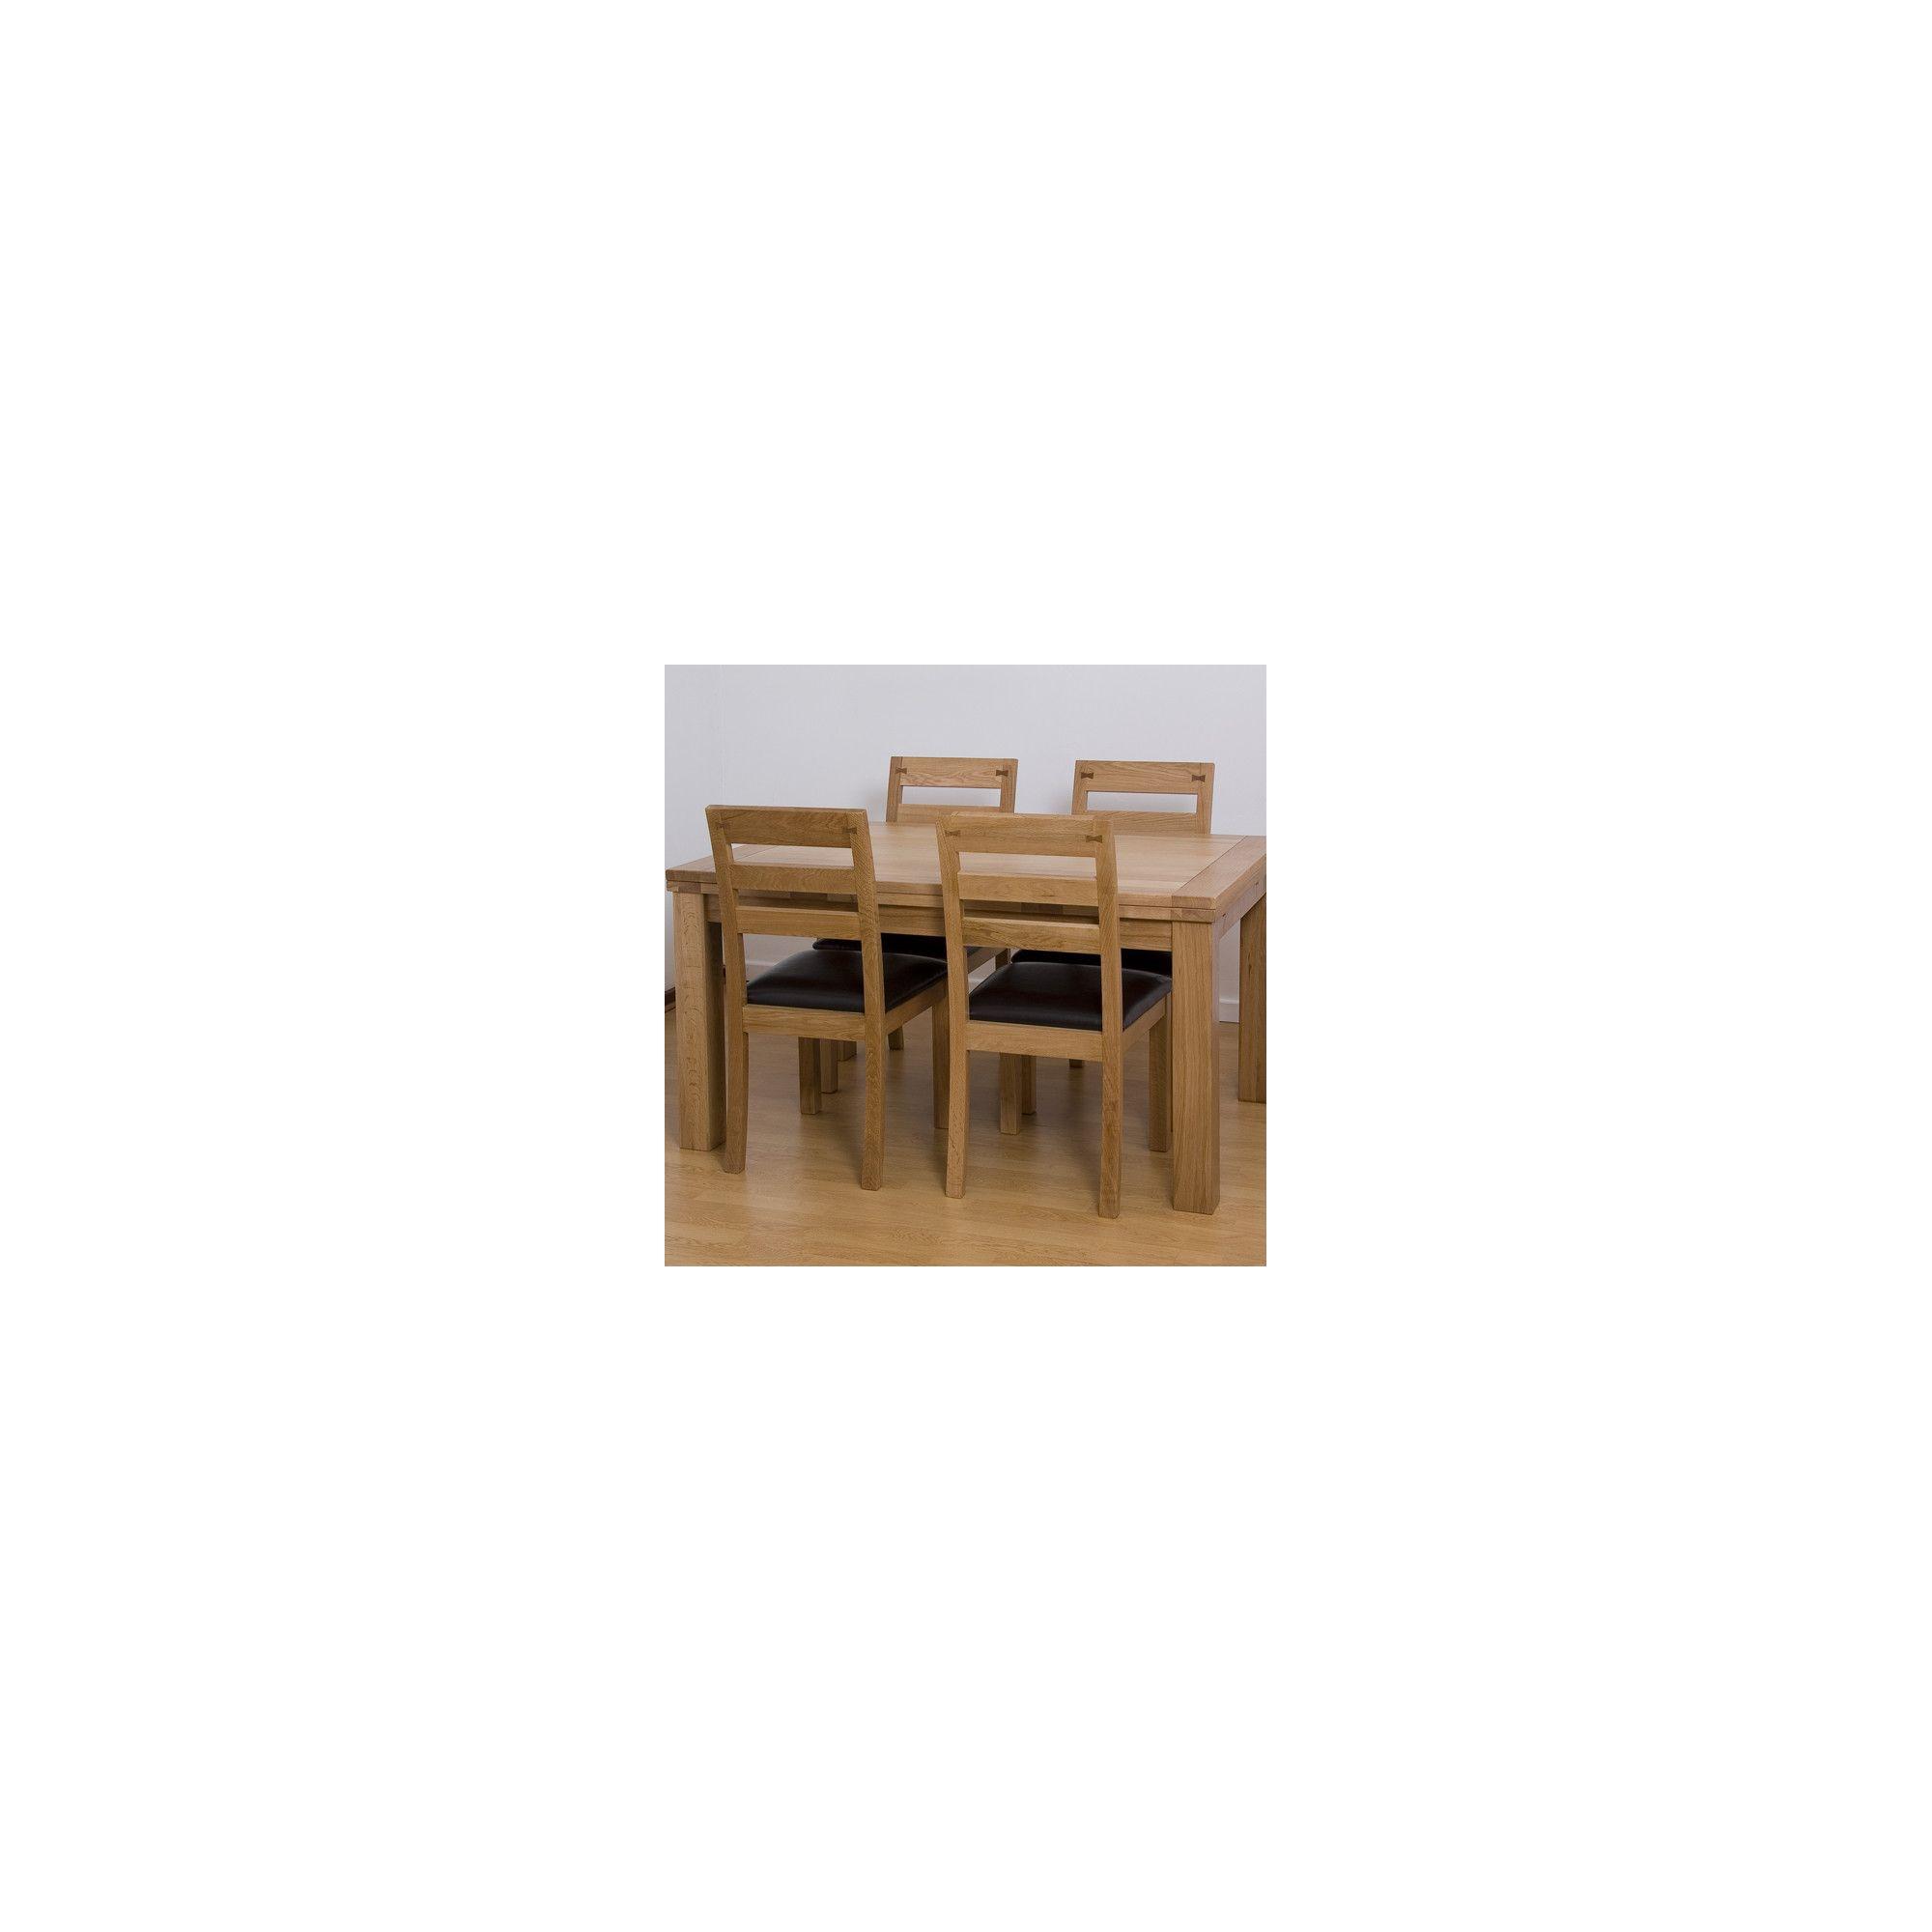 G&P Furniture 5 Piece Extending Oak Dining Set - 76.2cm H x 120cm - 180cm W x 80cm D at Tescos Direct